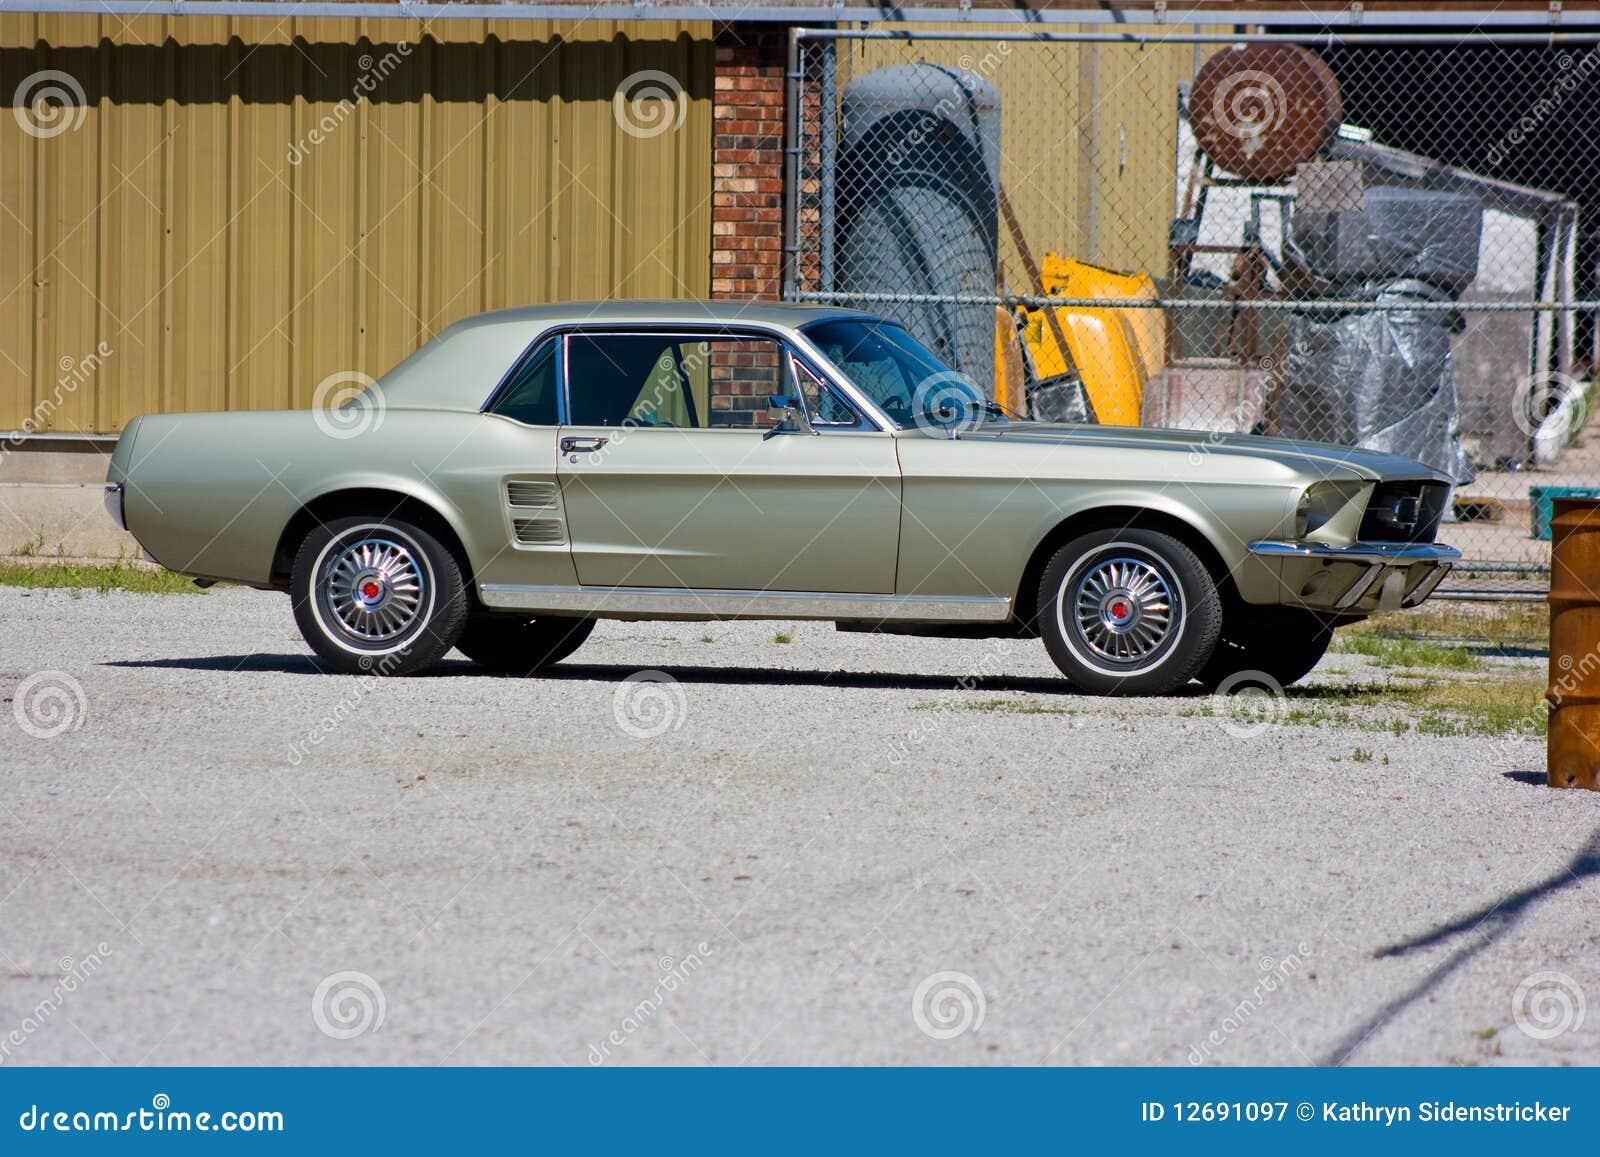 Ford Mustang Kupee 1967 Stockbild Bild Von Glänzend 12691097